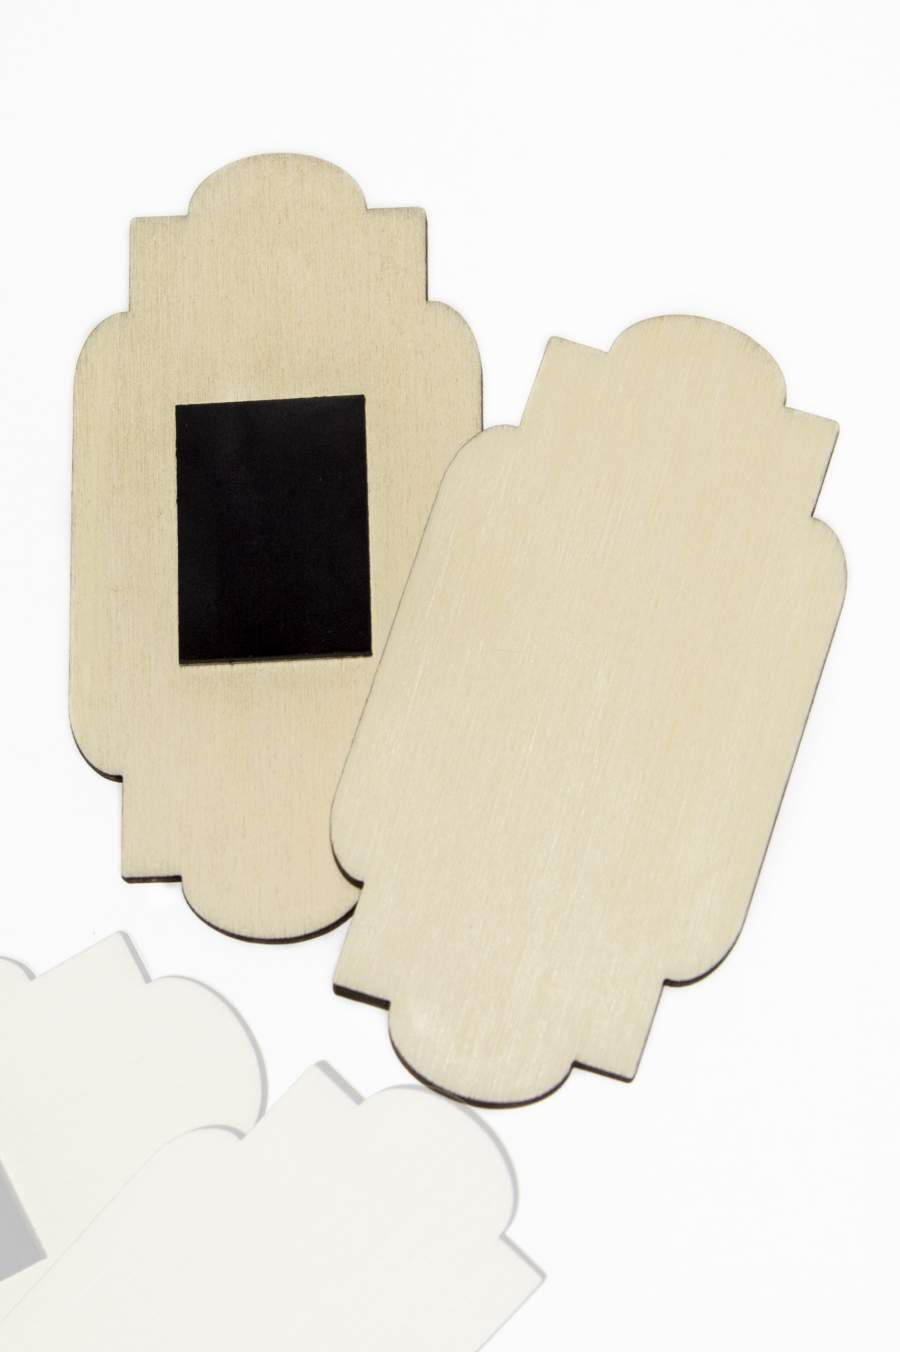 108. Drevená magnetka na chladničku – základný materiál 90x46mm